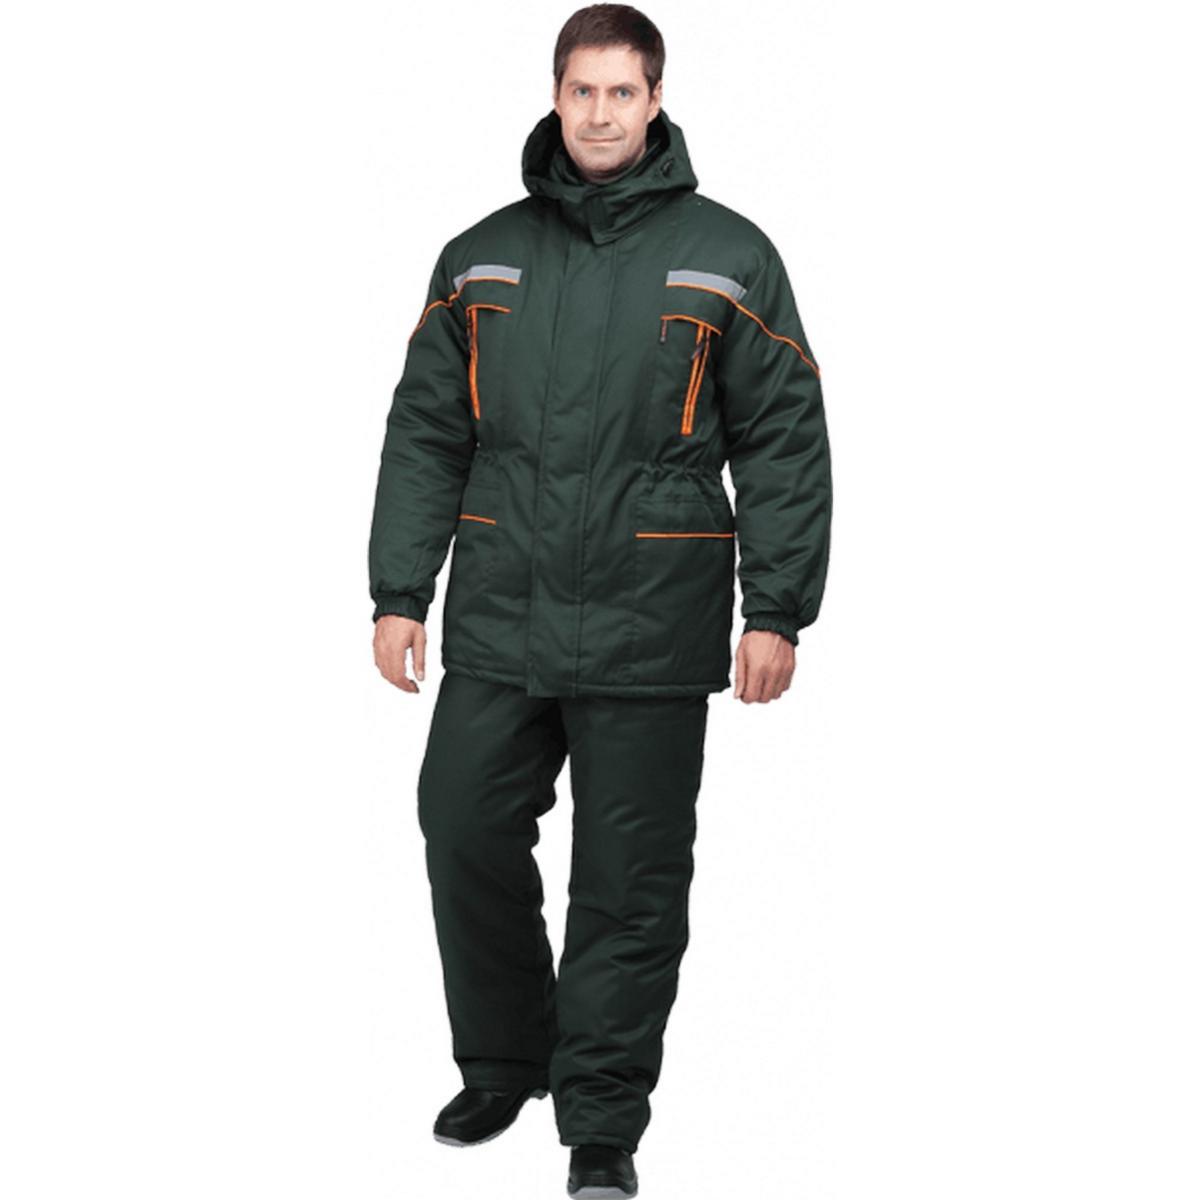 Куртка ЛАНДШАФТ утепленная зеленый (разм. 120-124 рост 182-188)